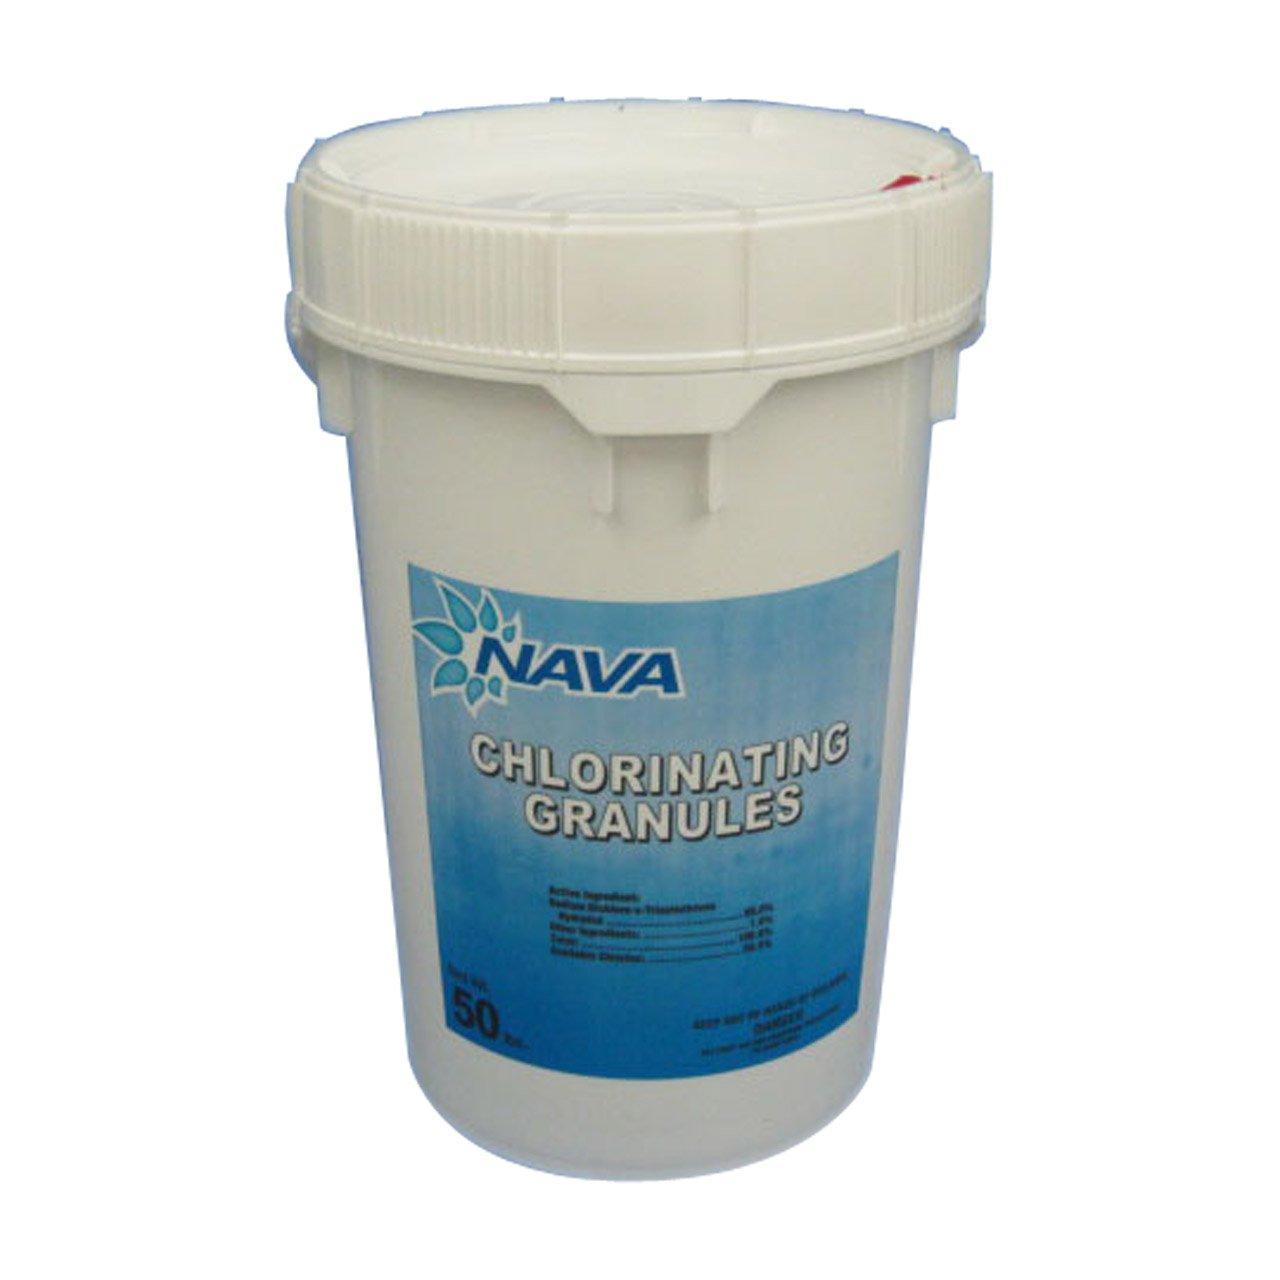 Nava Chlorinating Di-Chlor Granules - 50 lb. Bucket by NAVA